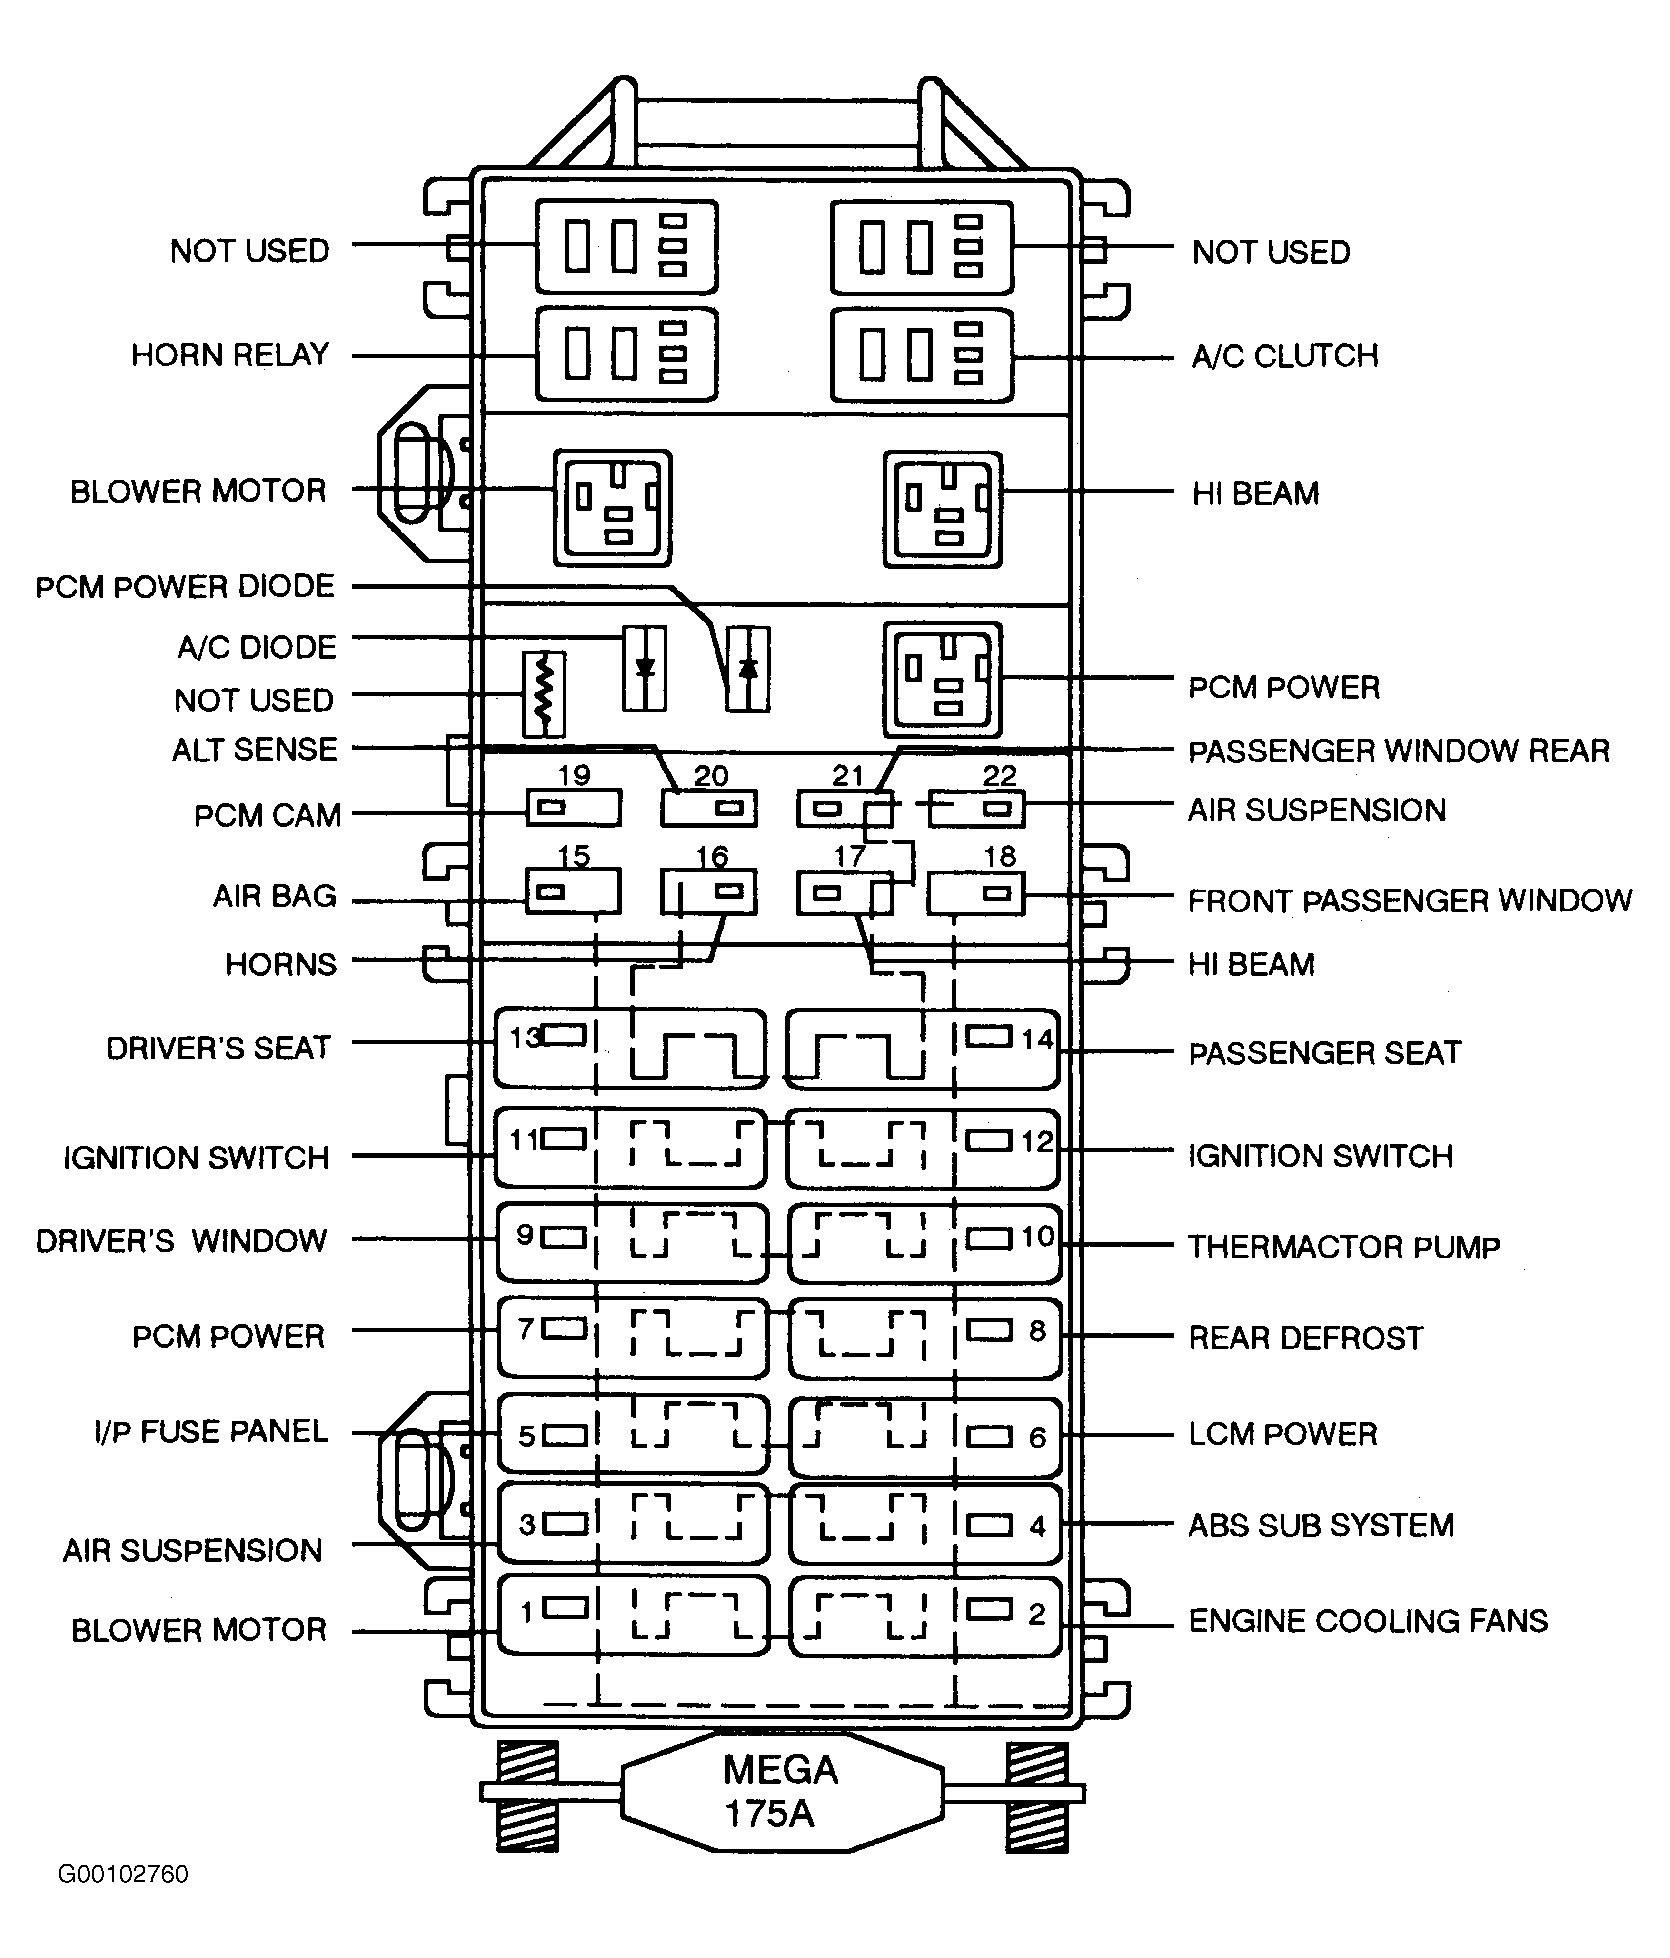 Diagram 1996 Lincoln Town Car Fuse Panel Diagram Wiring Full Version Hd Quality Diagram Wiring Diagrambarbaf Fitetsicilia It